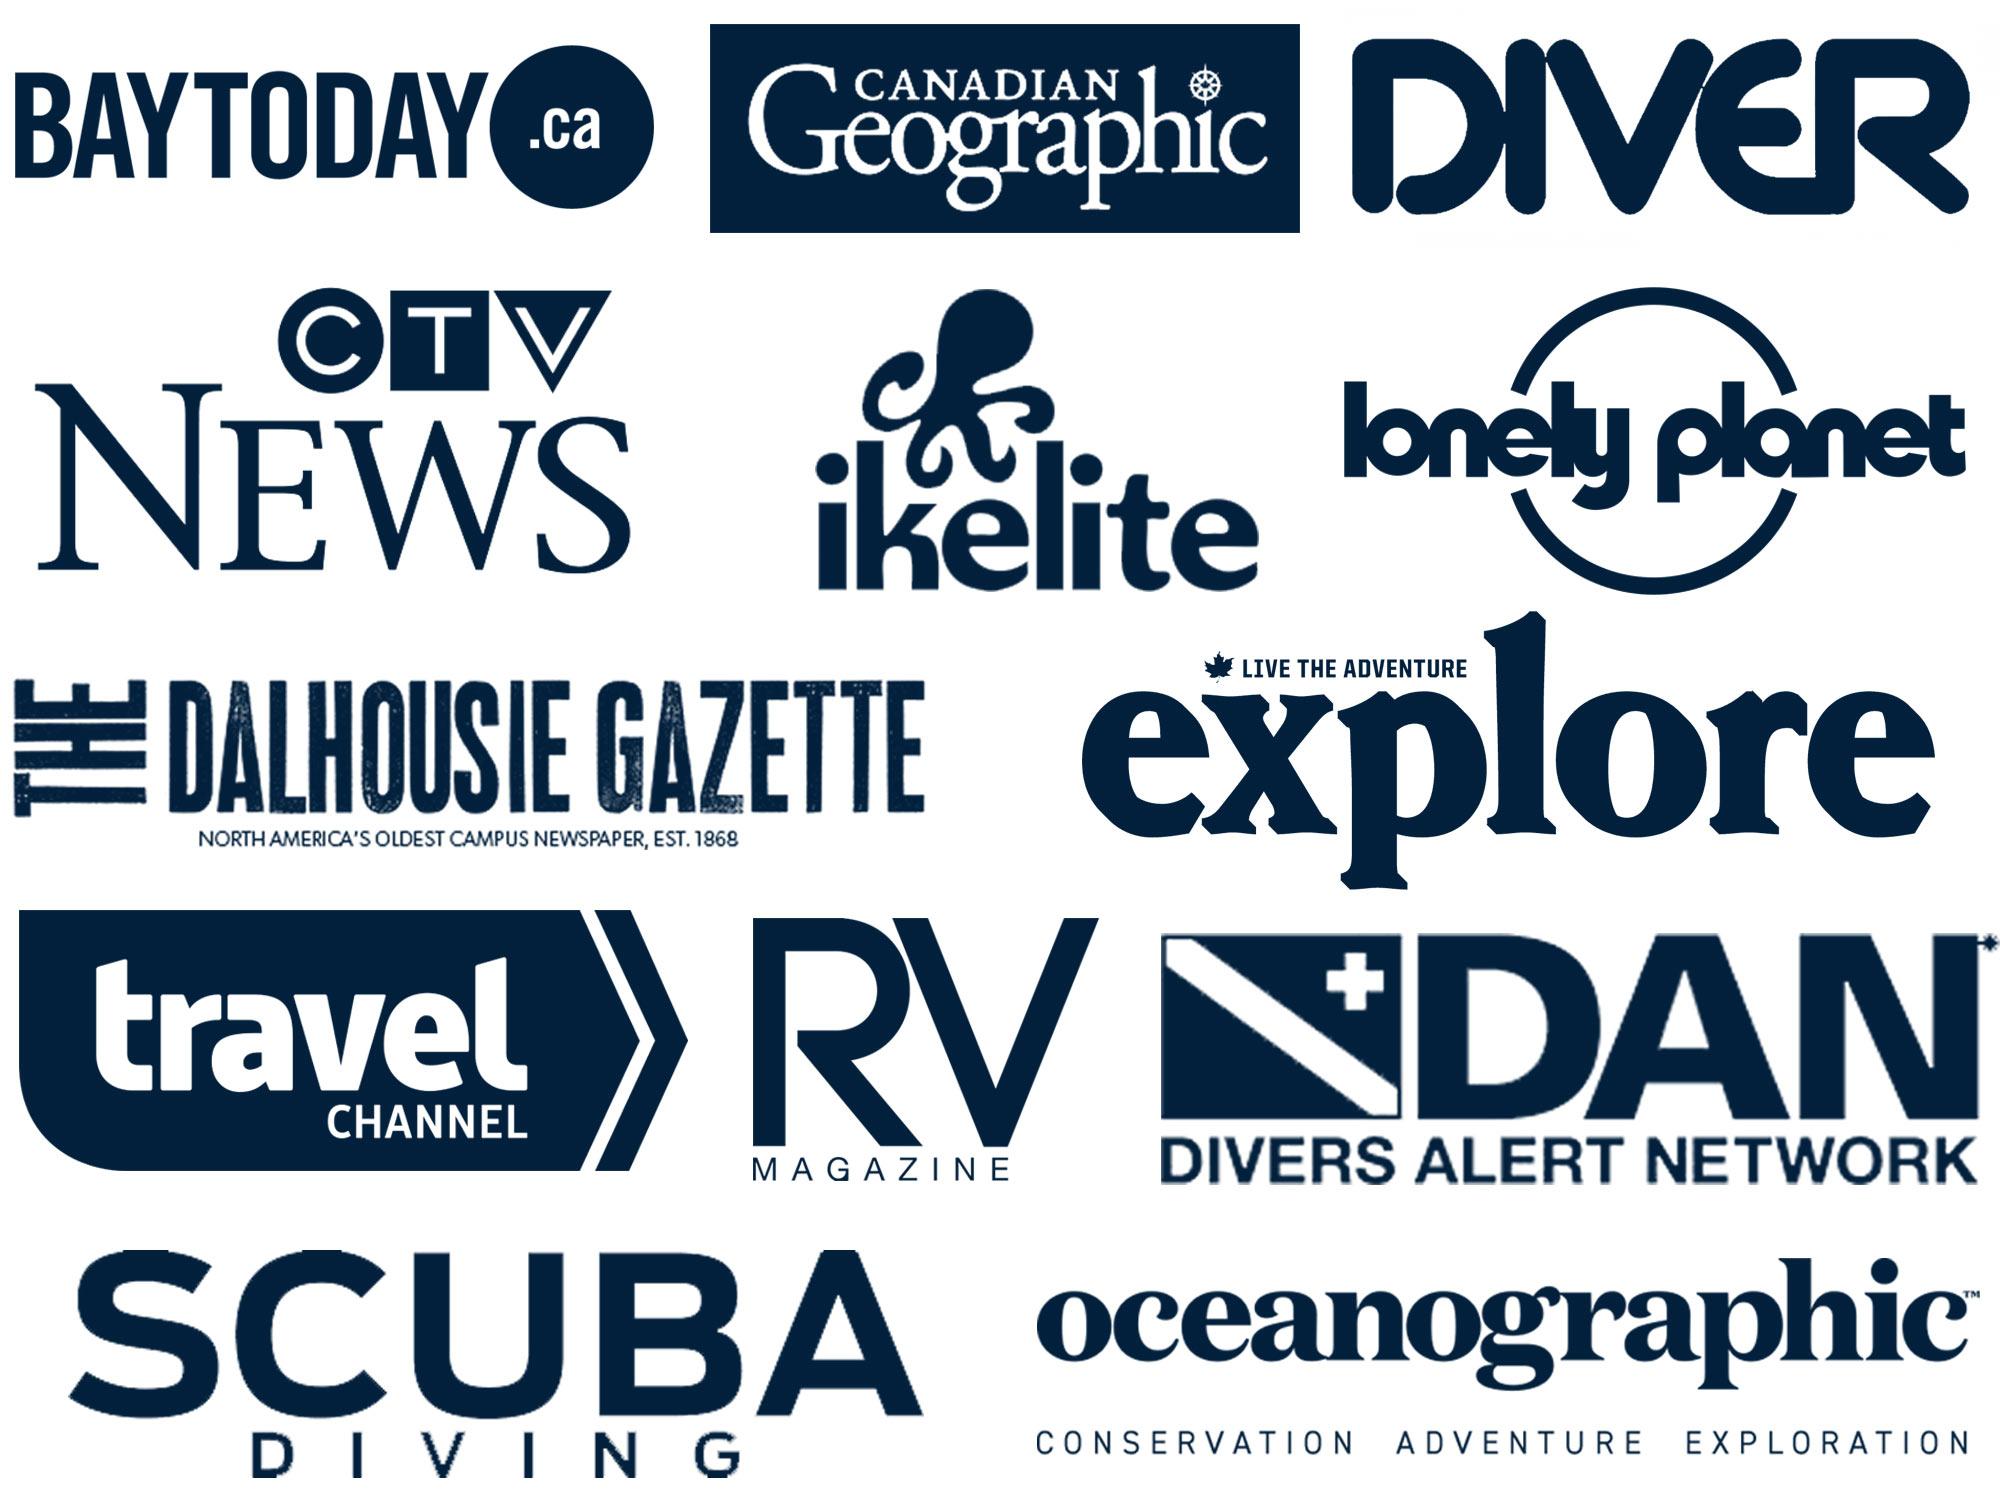 Dive Buddies Partner Feature And Publications